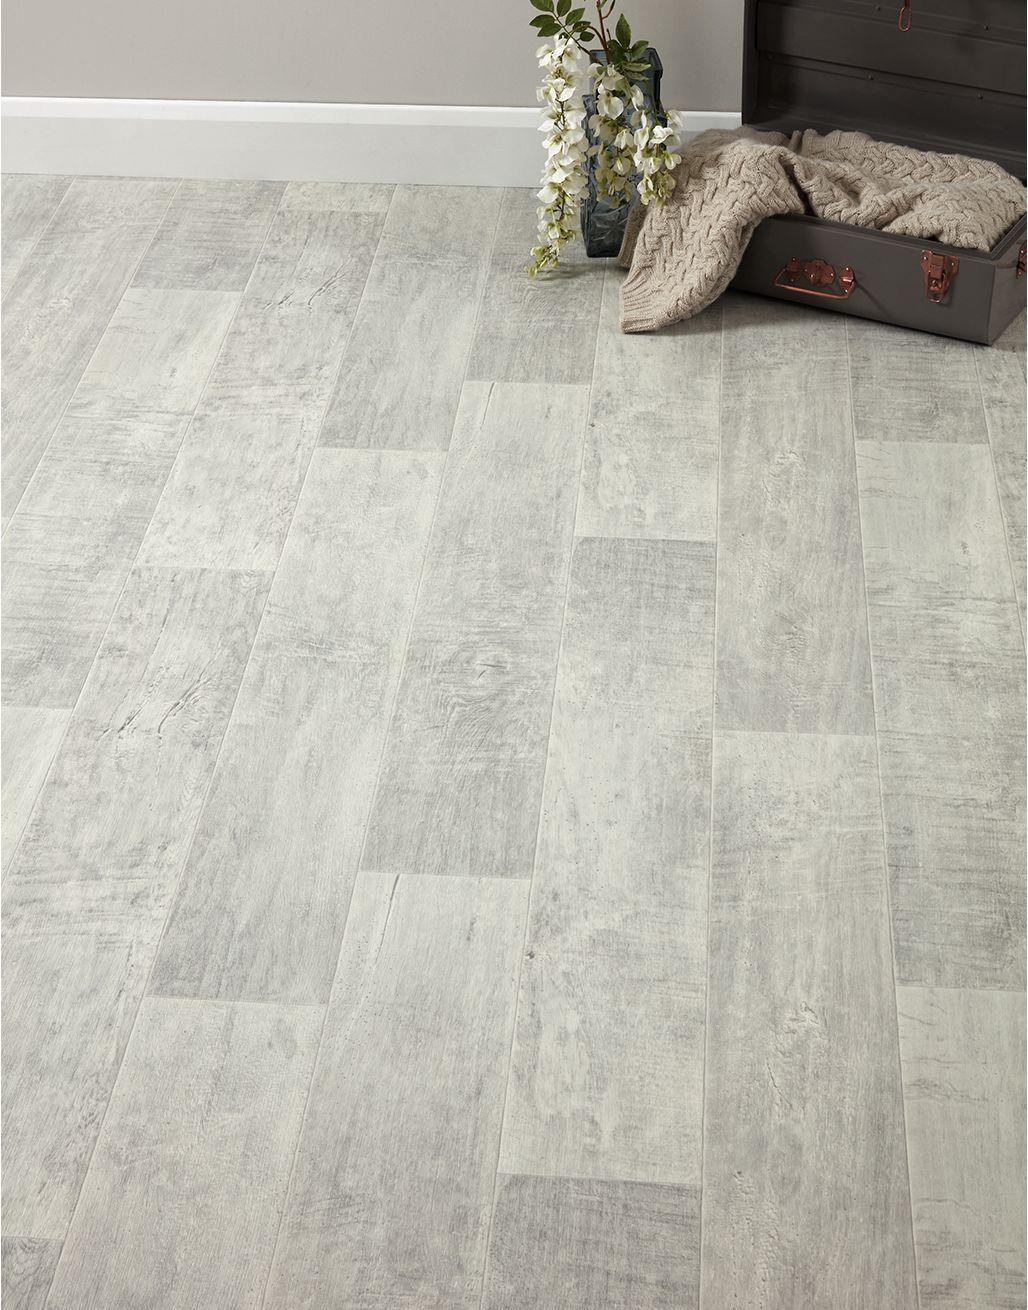 Denver Granite Oak Flooring Super, Laminate Flooring Denver